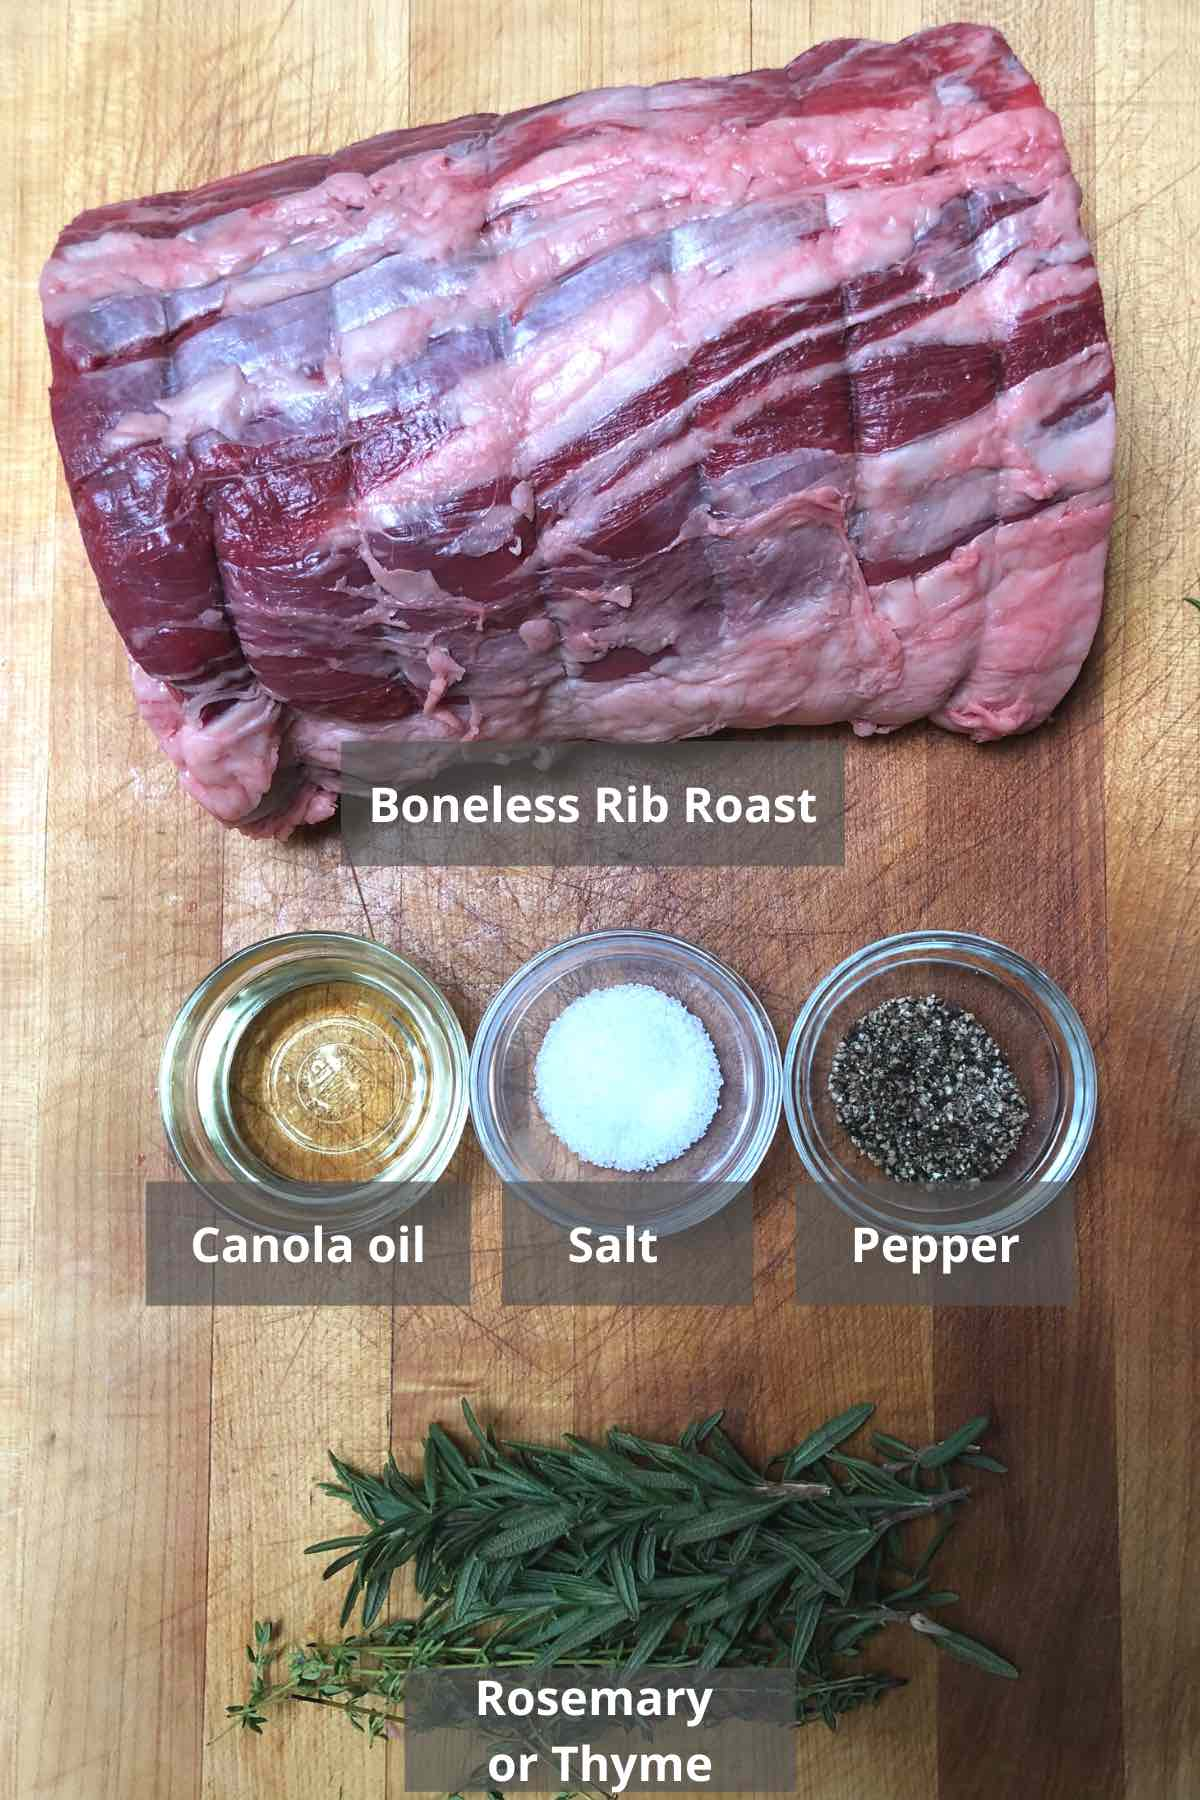 Ingredients for making a boneless prime rib roast